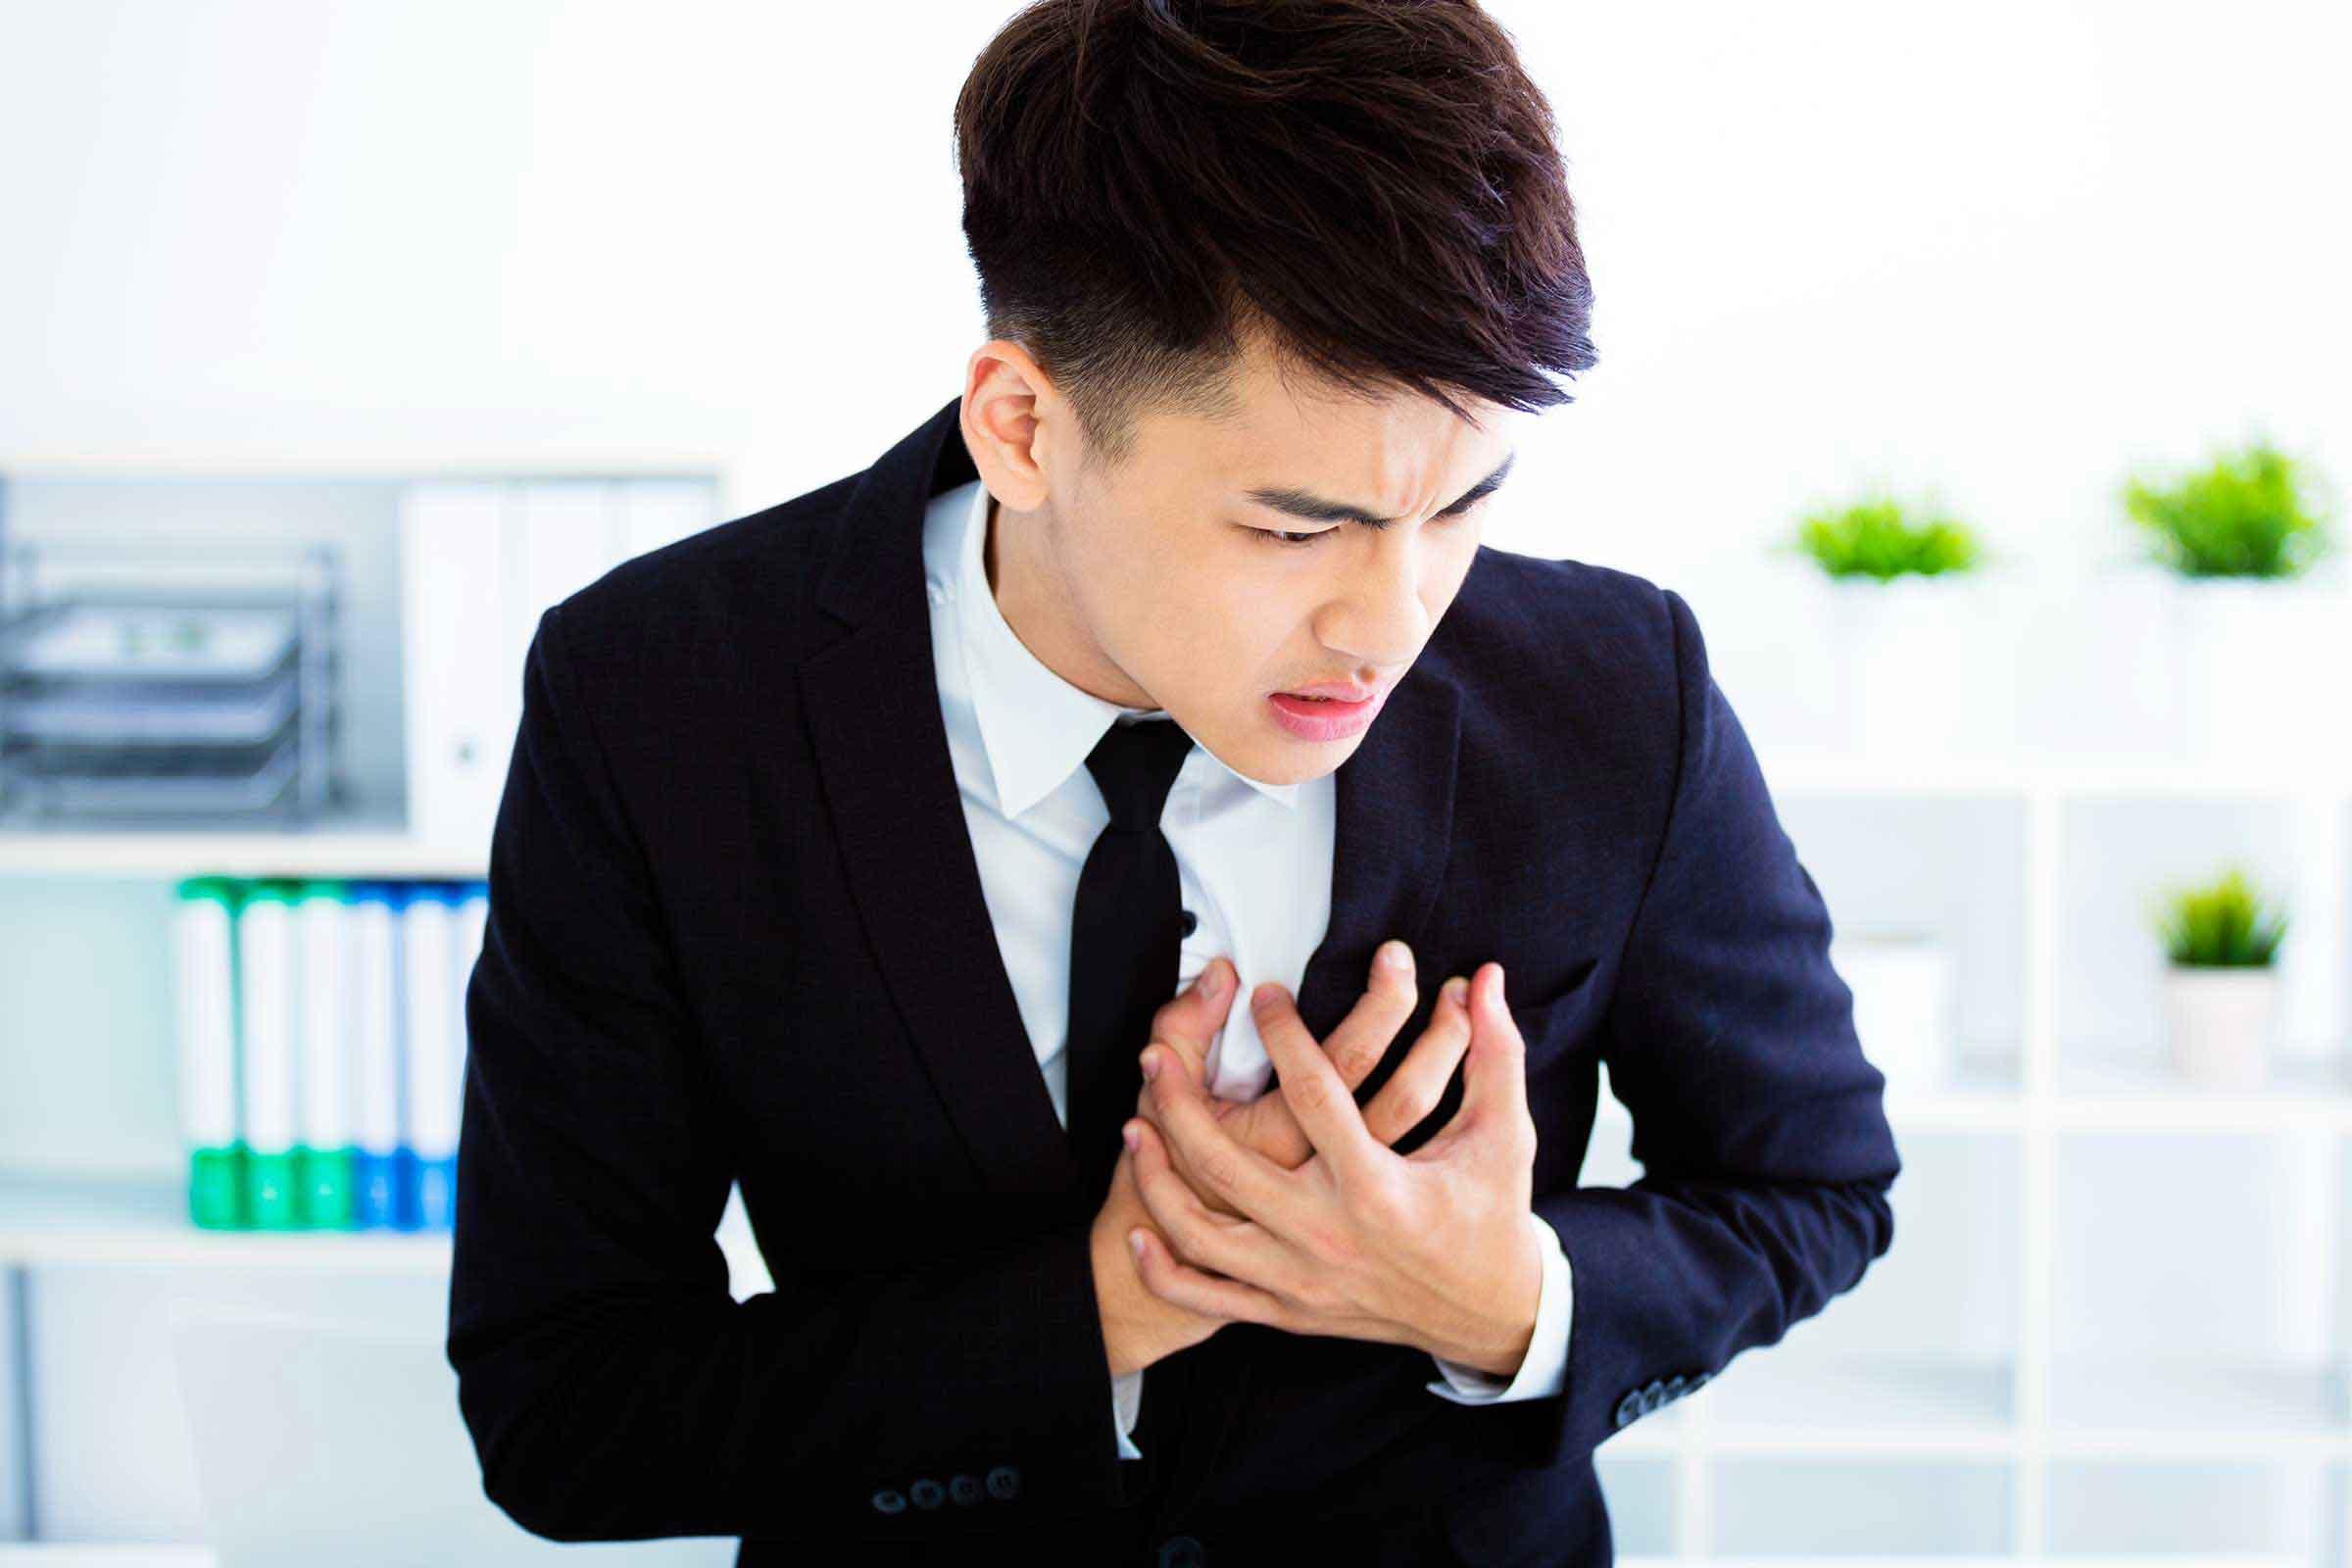 تفاوت پانیک اتک و حمله ی قلبی